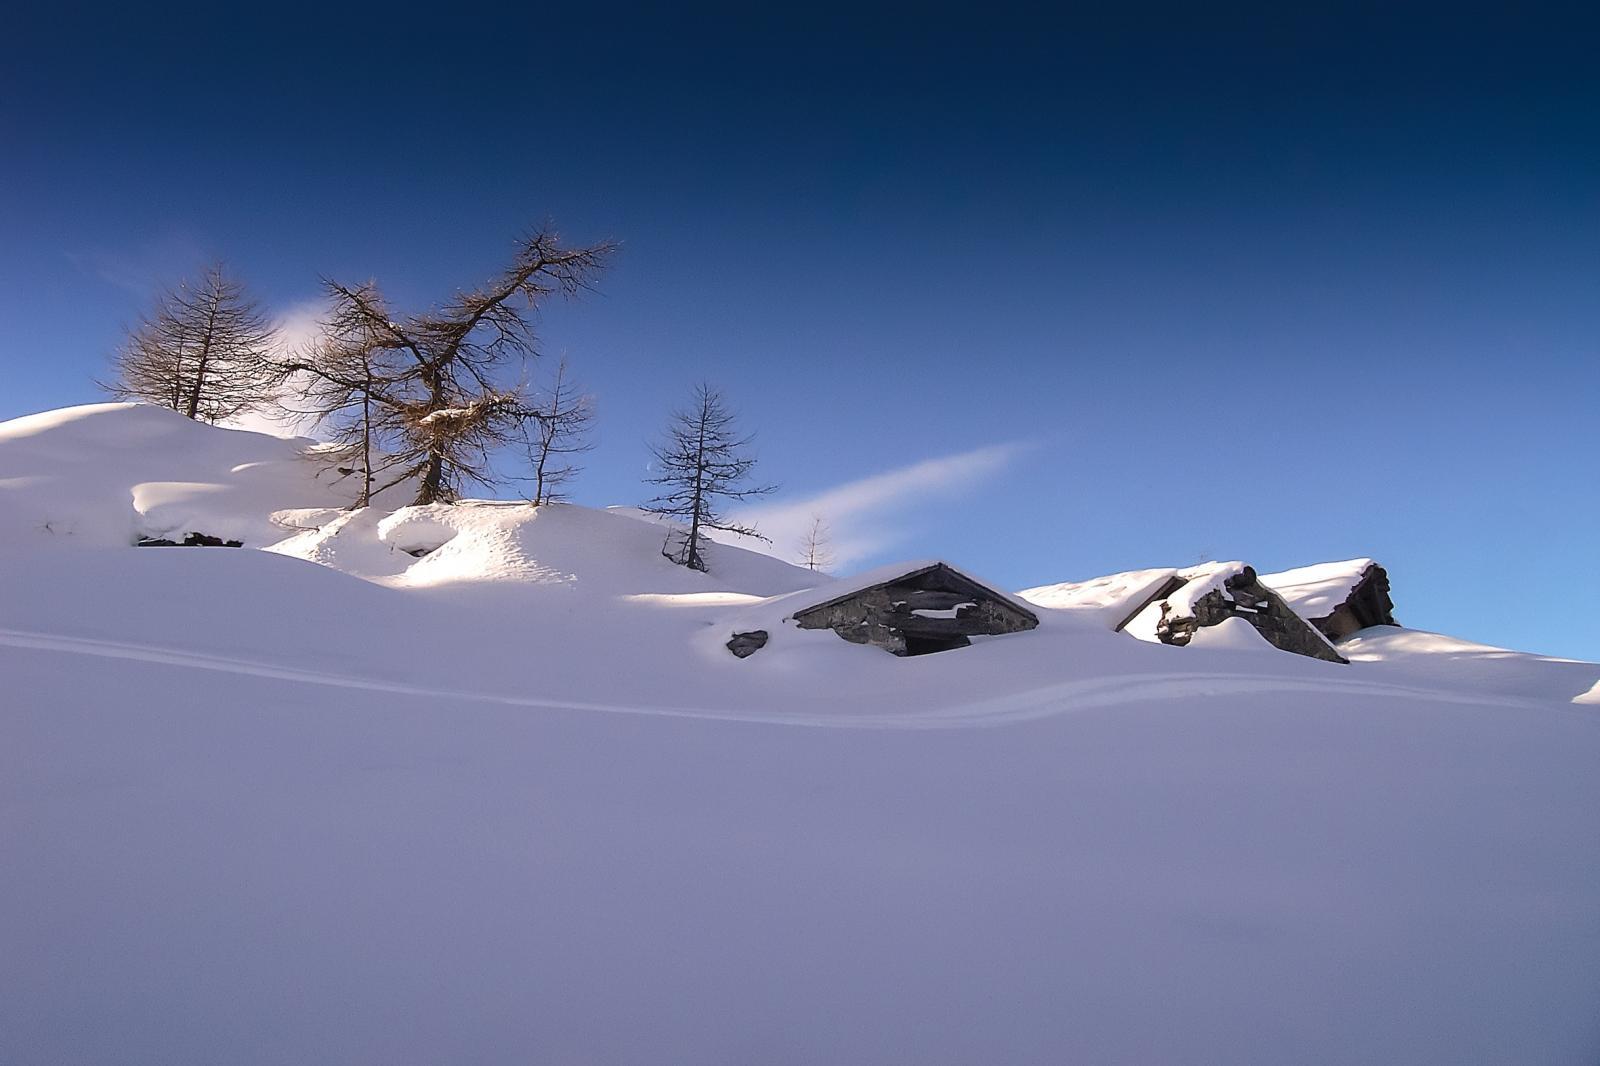 arrivo all'Alpe d'Arguel